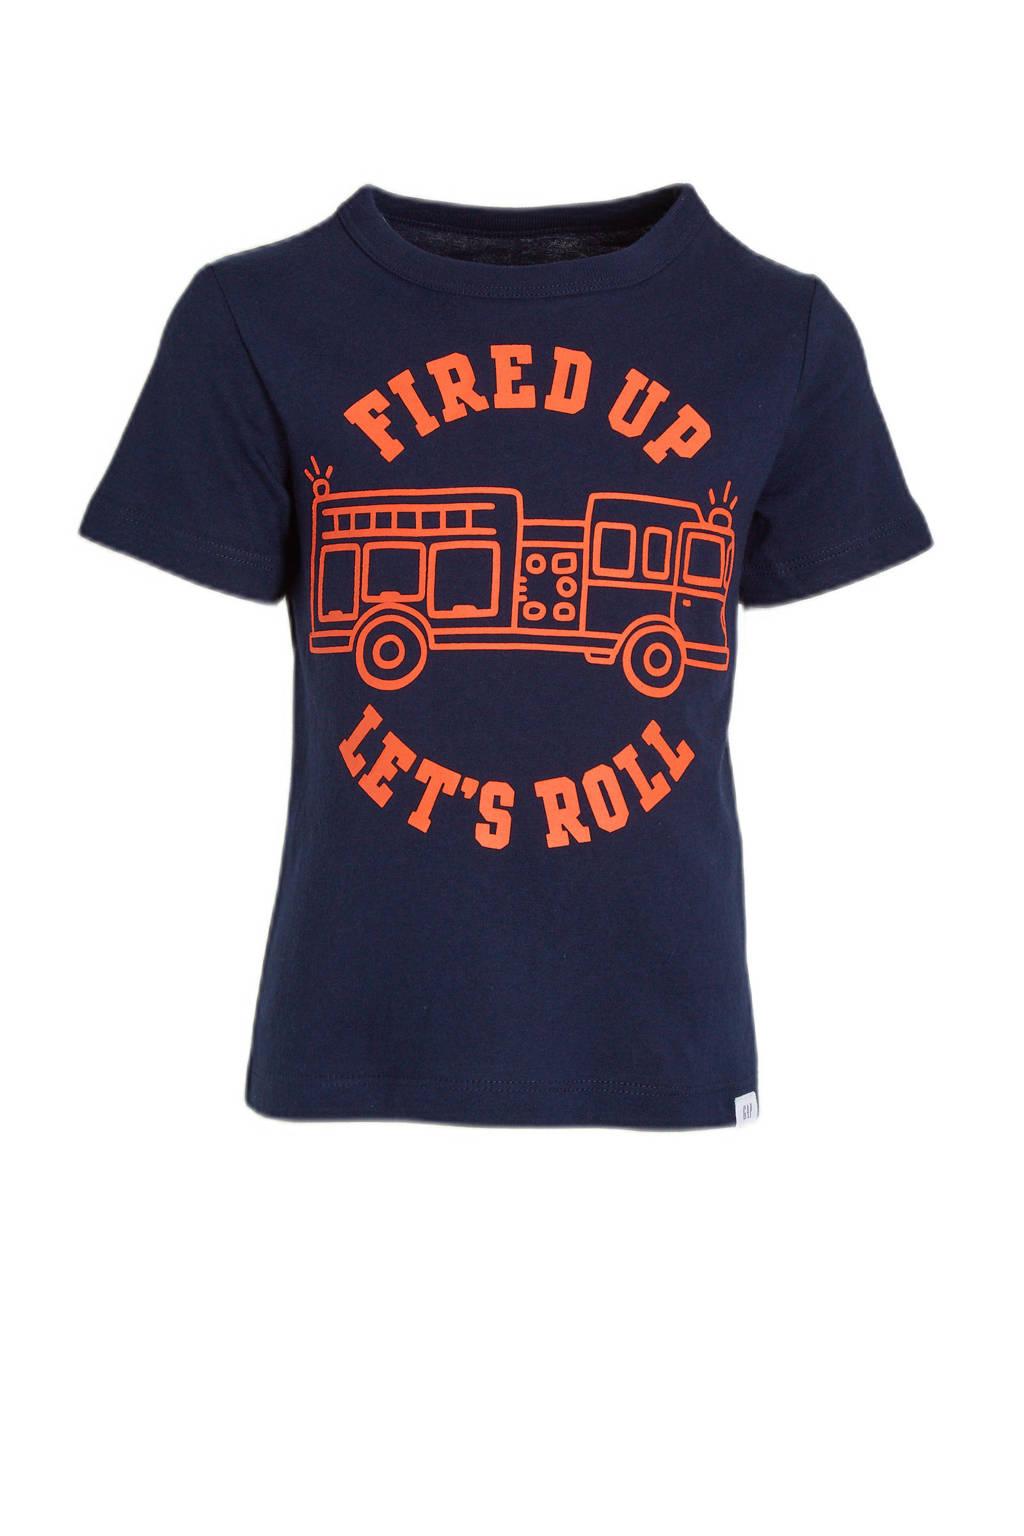 GAP T-shirt met printopdruk donkerblauw/rood, Donkerblauw/rood